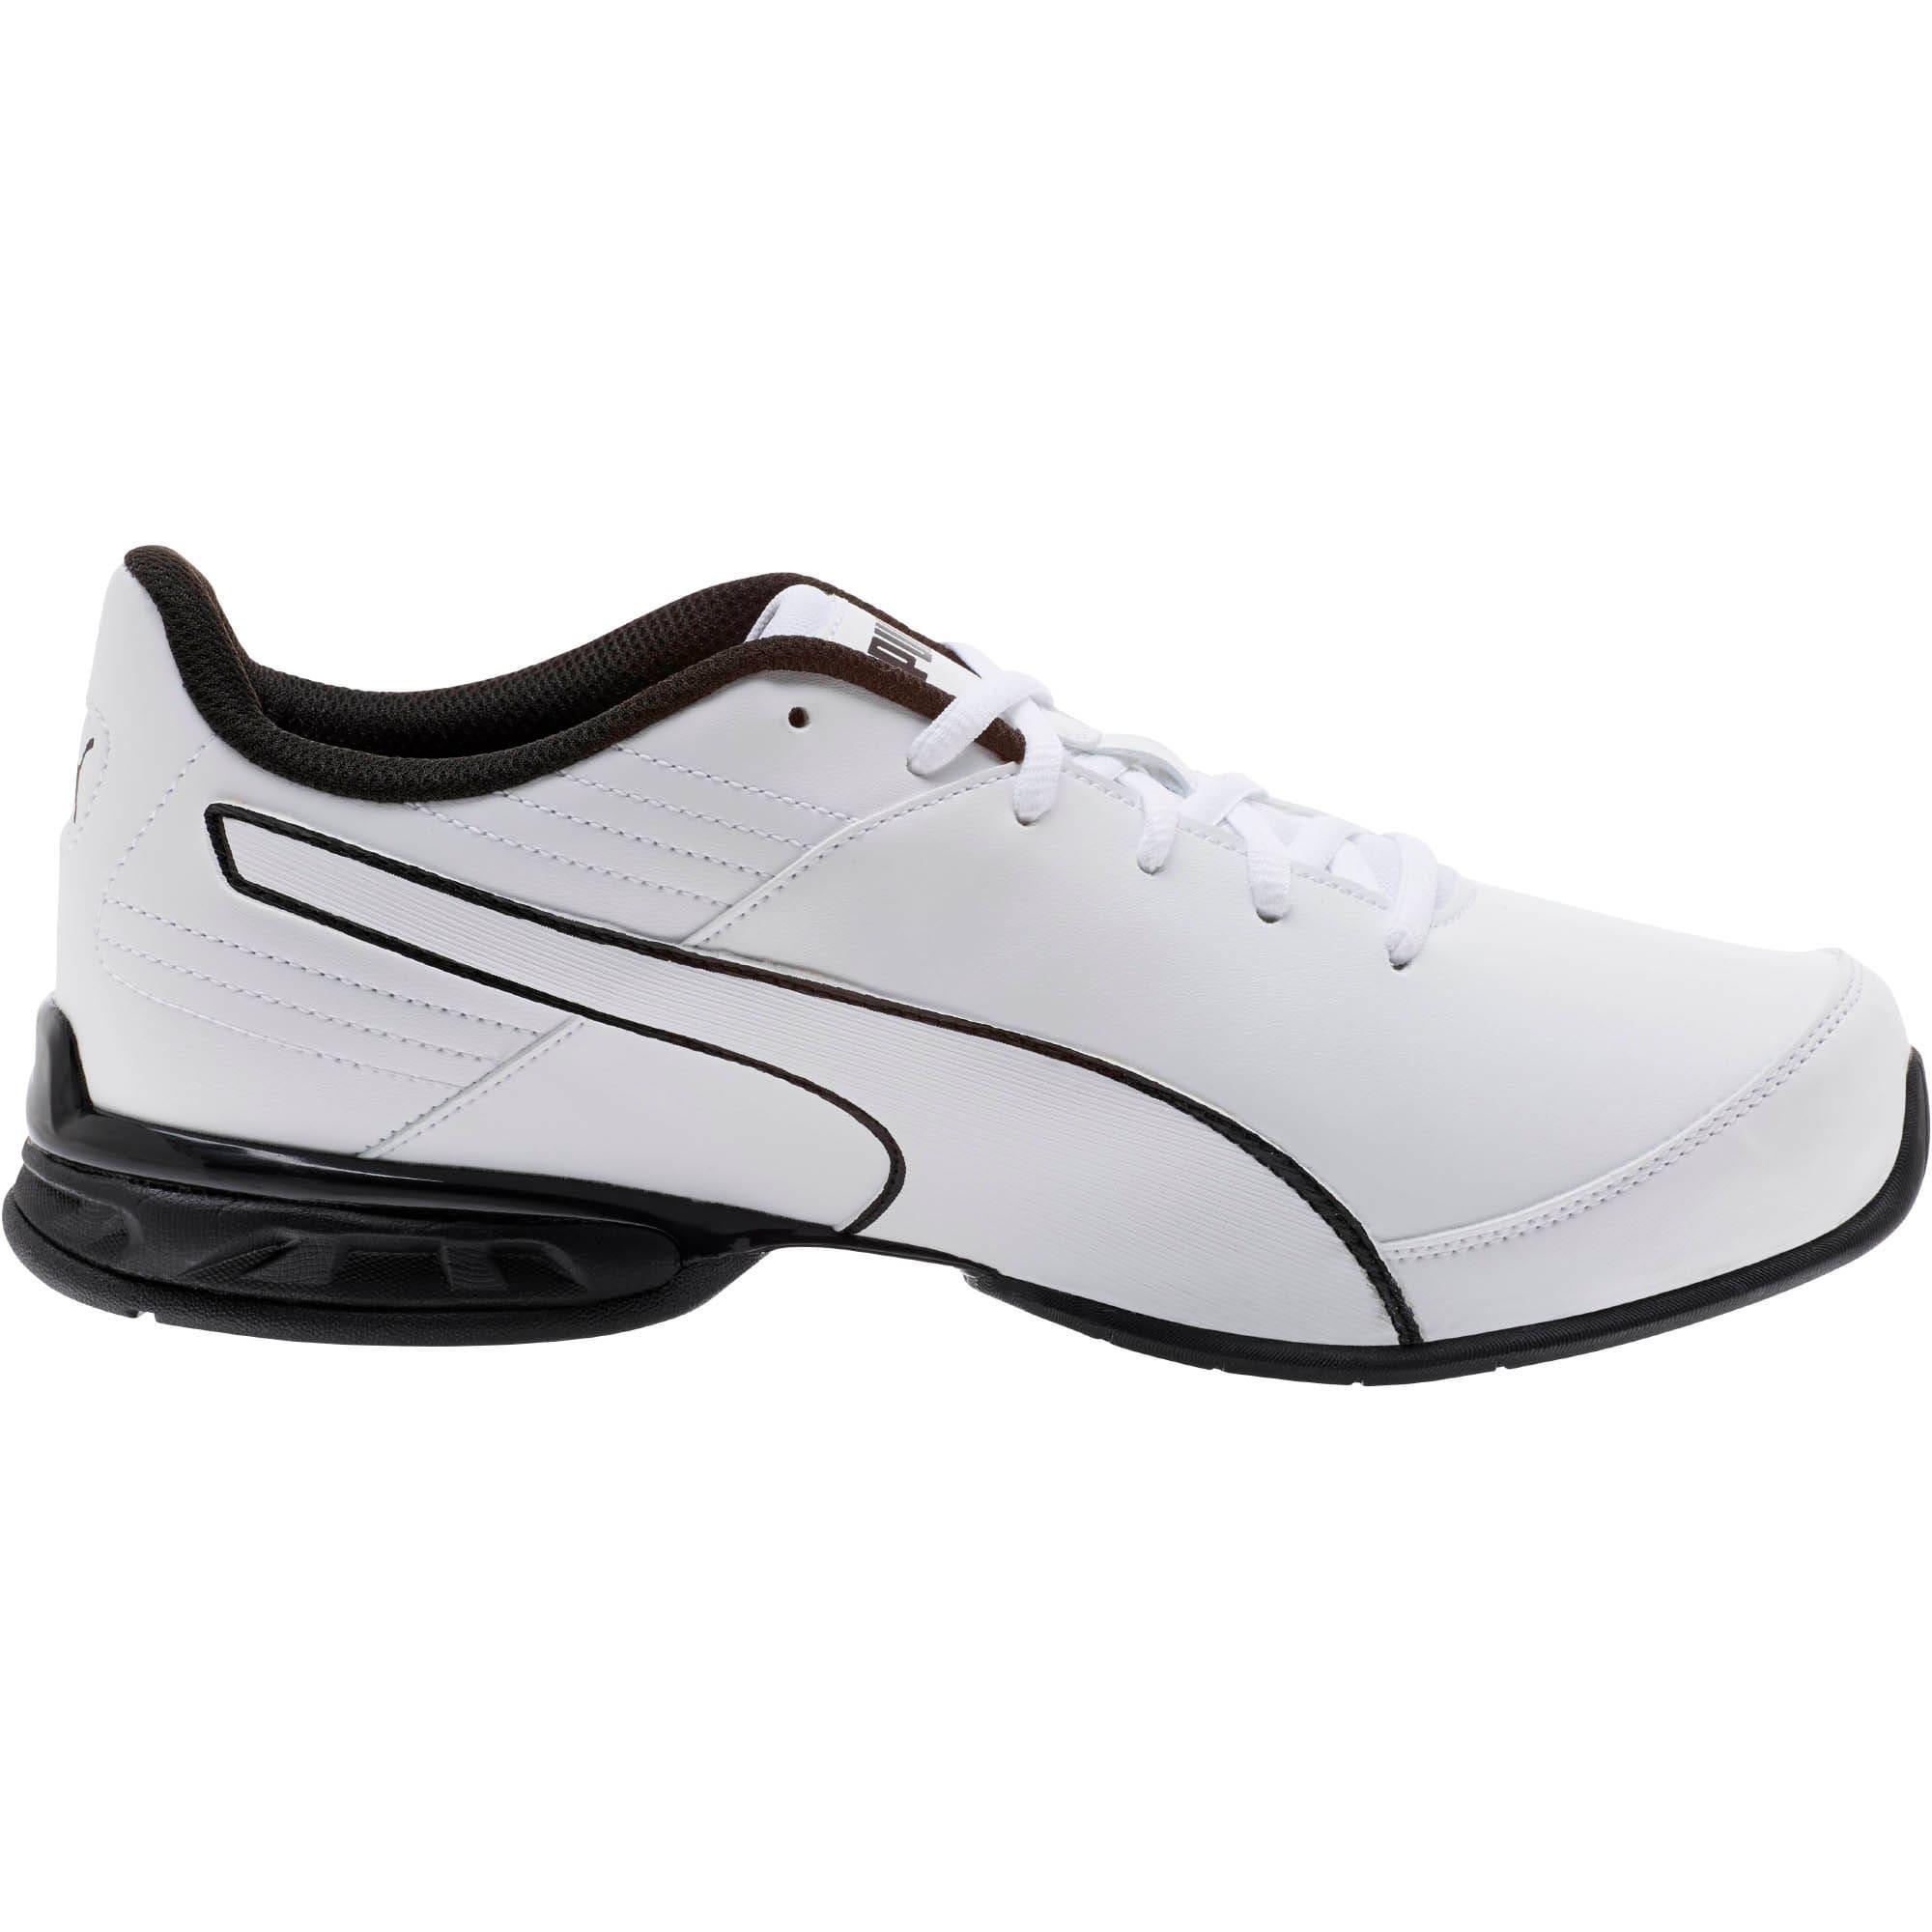 Thumbnail 3 of Super Levitate Men's Running Shoes, Puma White-Puma Black, medium